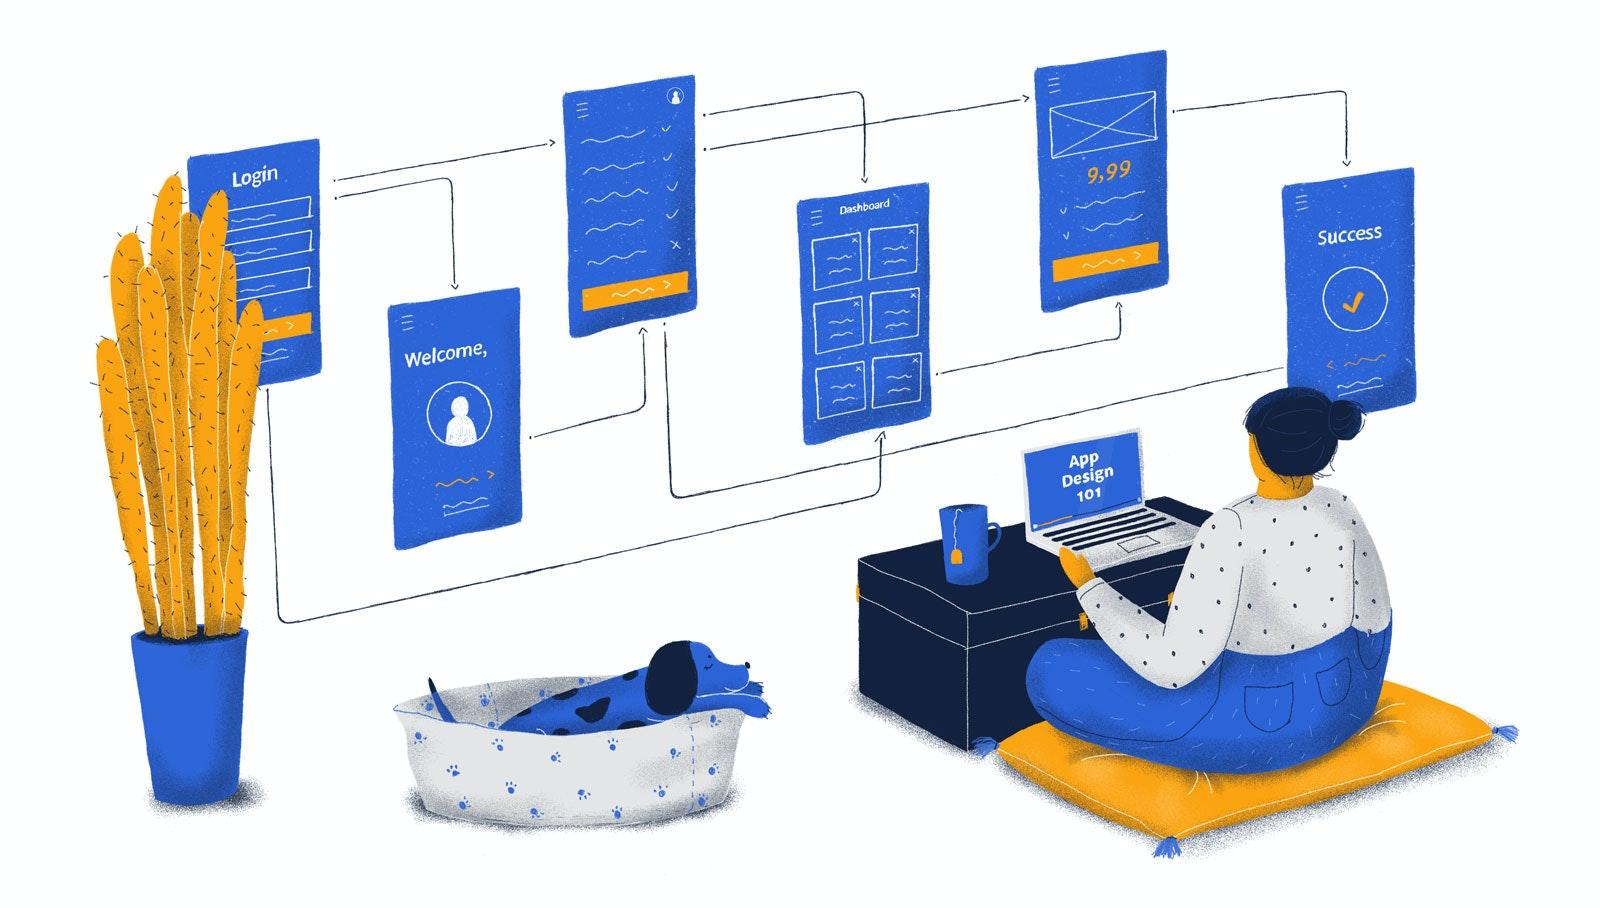 A Guide to App Design Process (for Non-designers!)